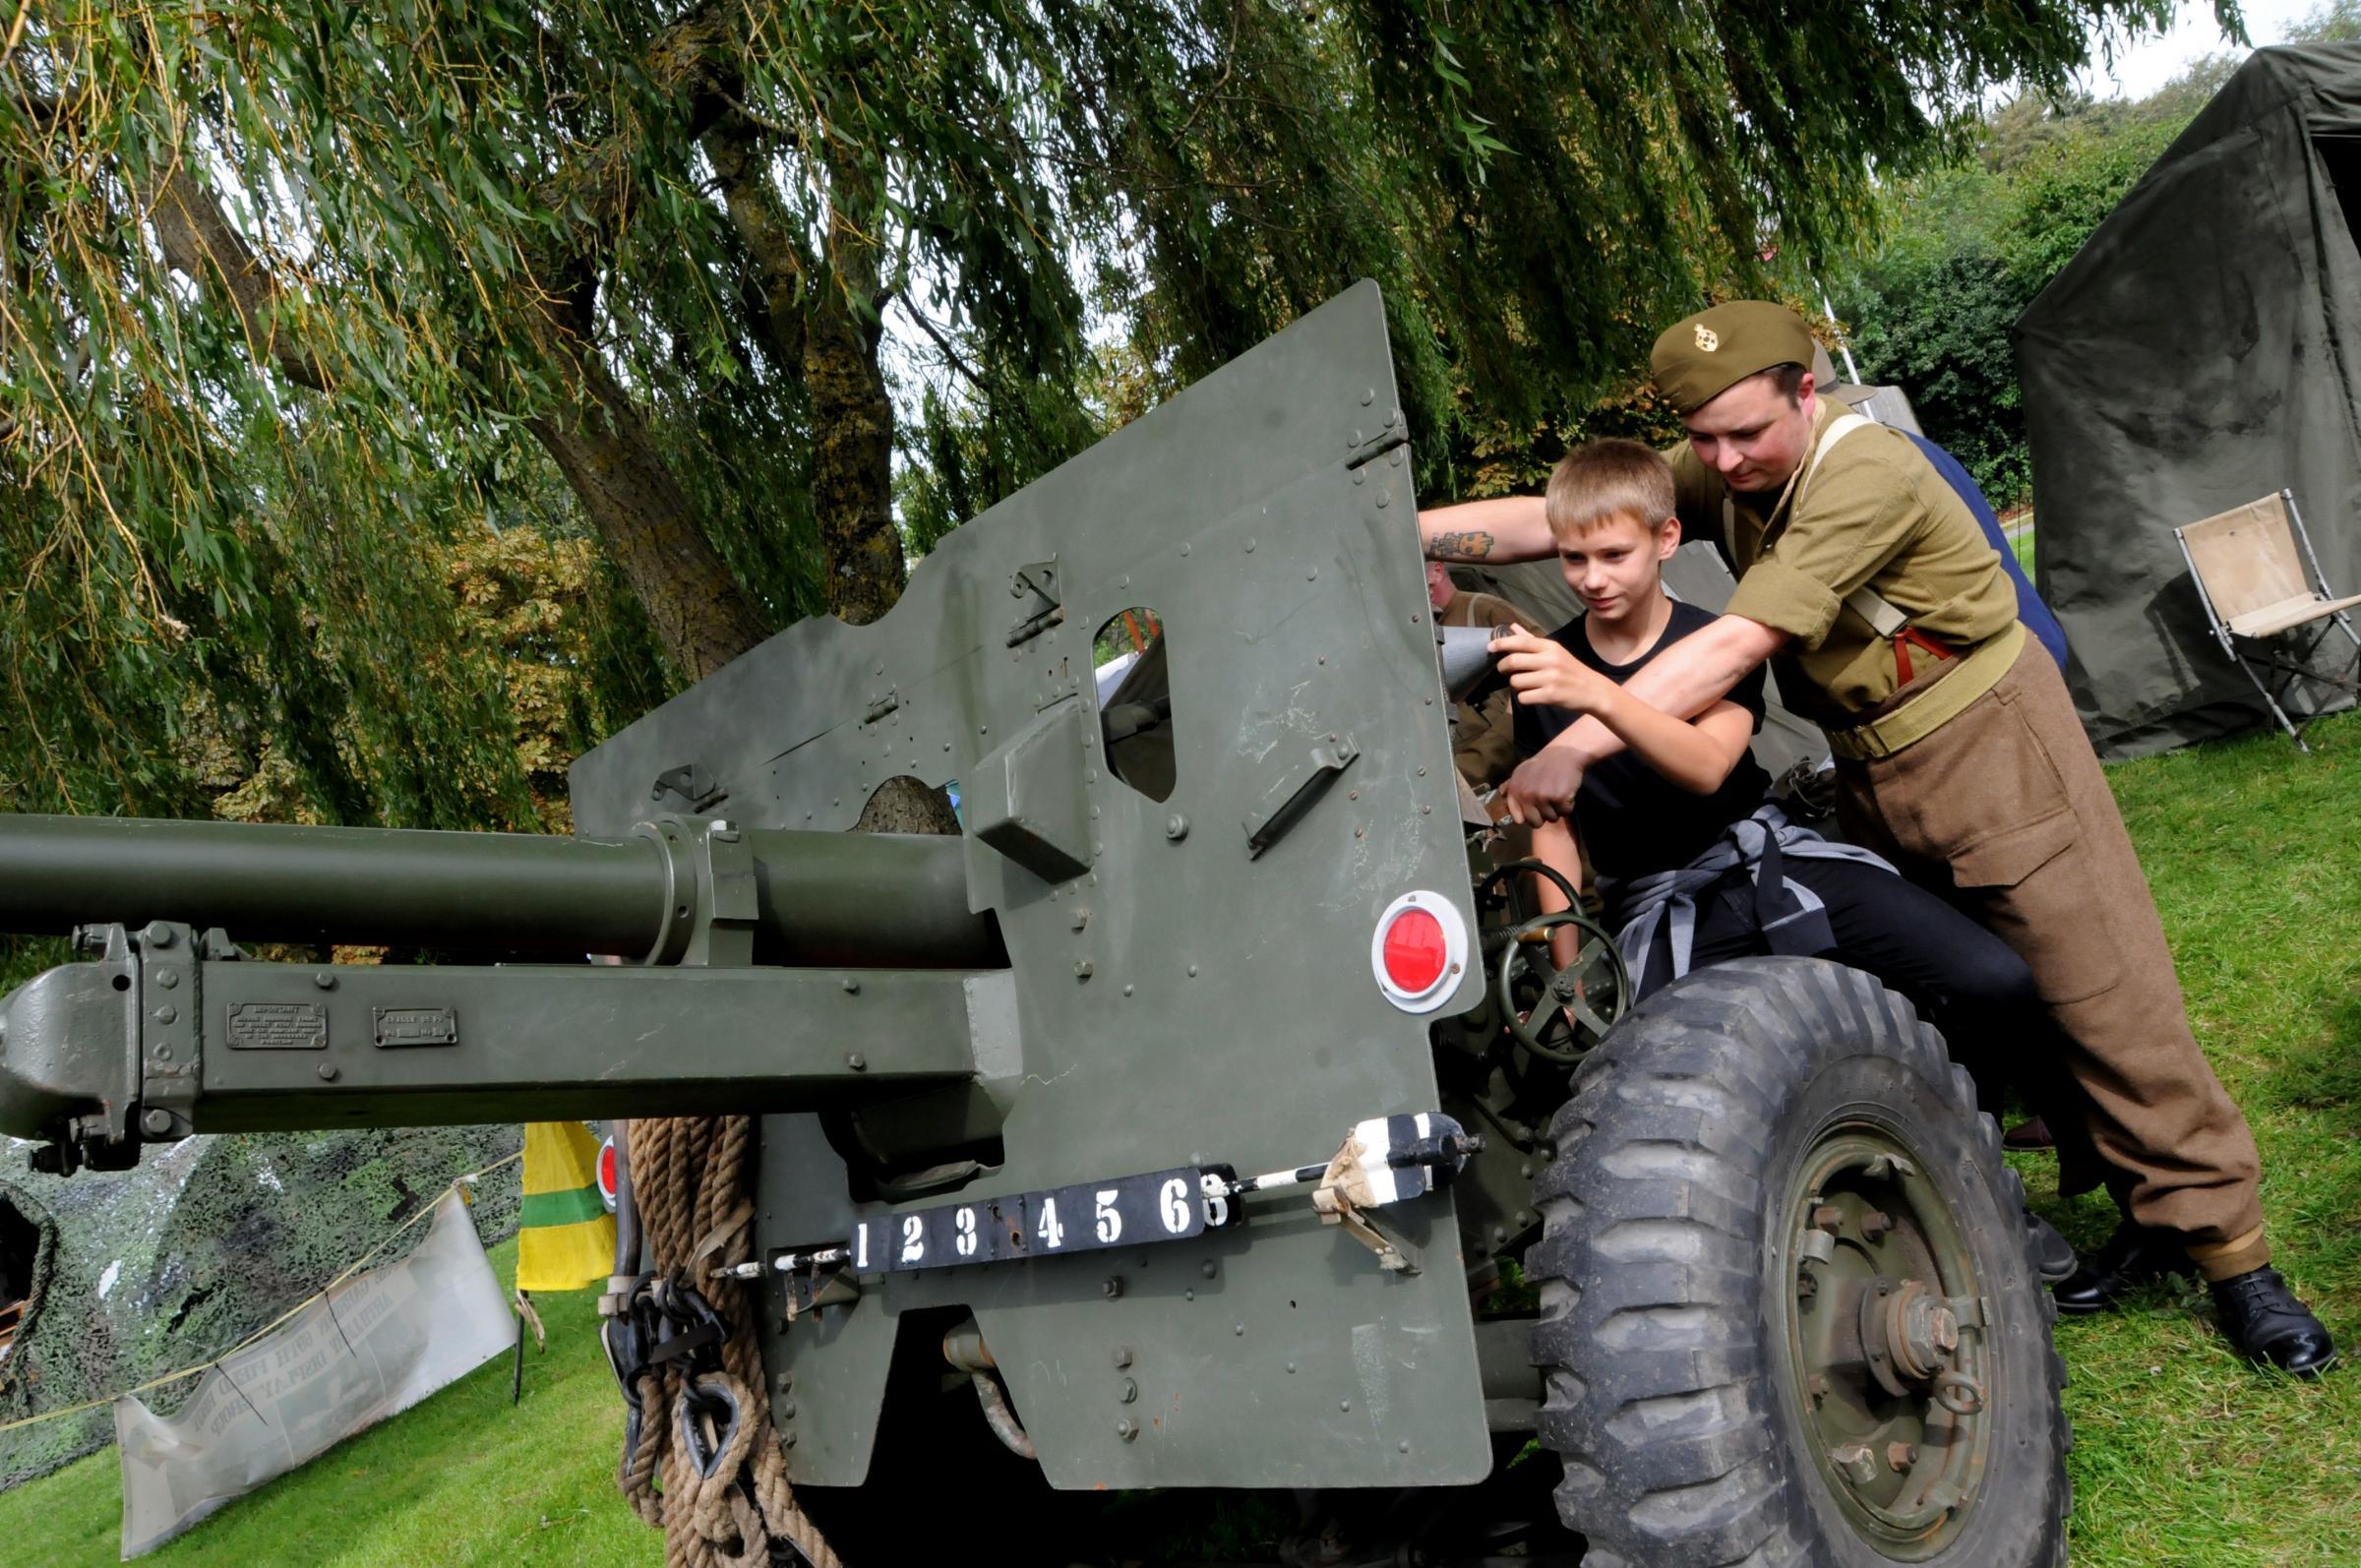 GALLERY: Nostalgia weekend celebrates Burtonwood airbase personnel